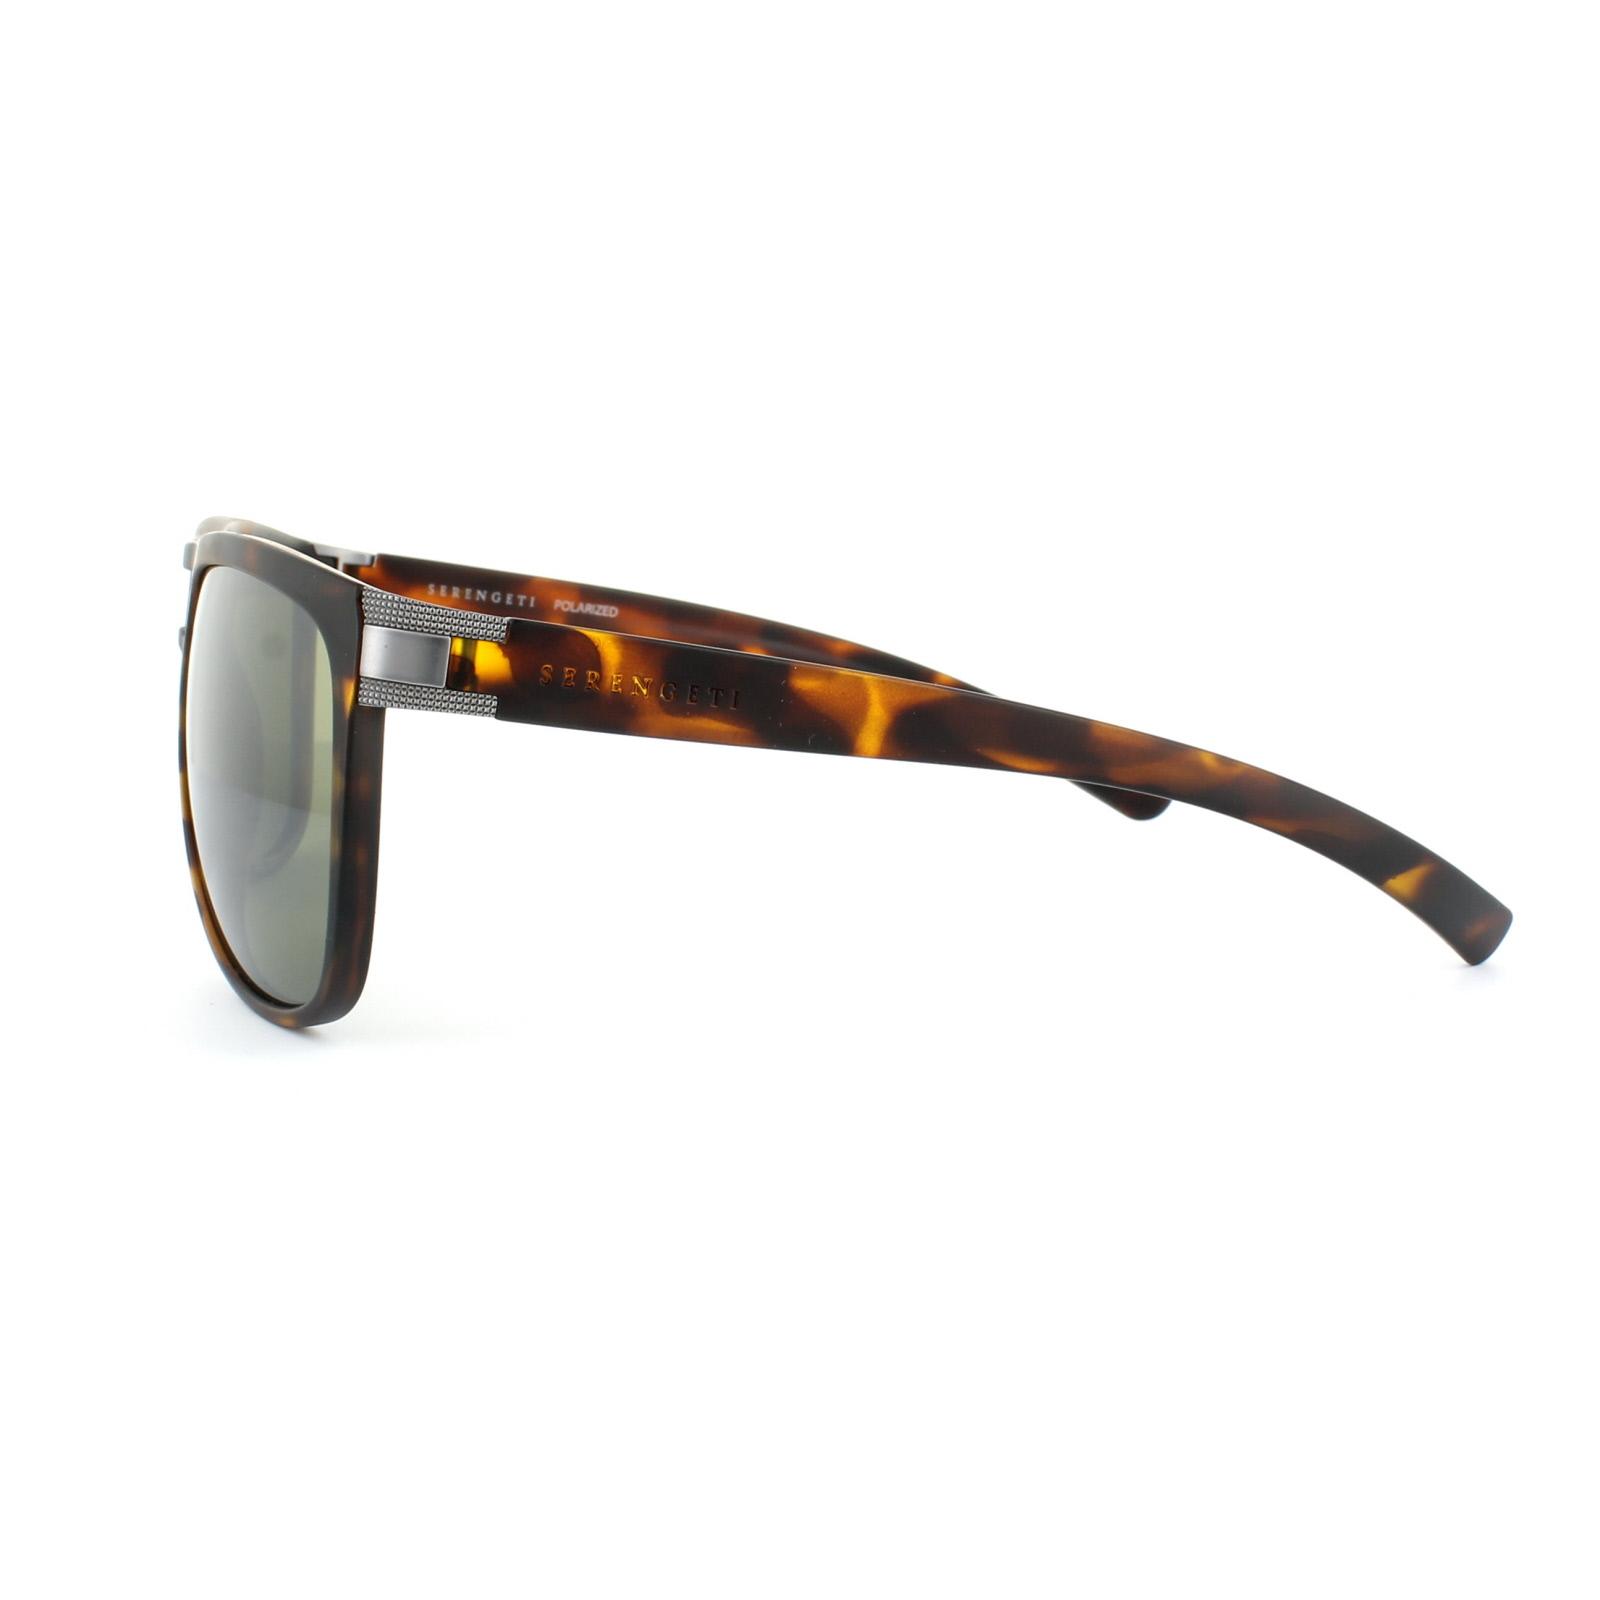 fbf0546b7498 Sentinel Serengeti Sunglasses Verdi 7936 Satin Tortoise Green 555nm  Polarized